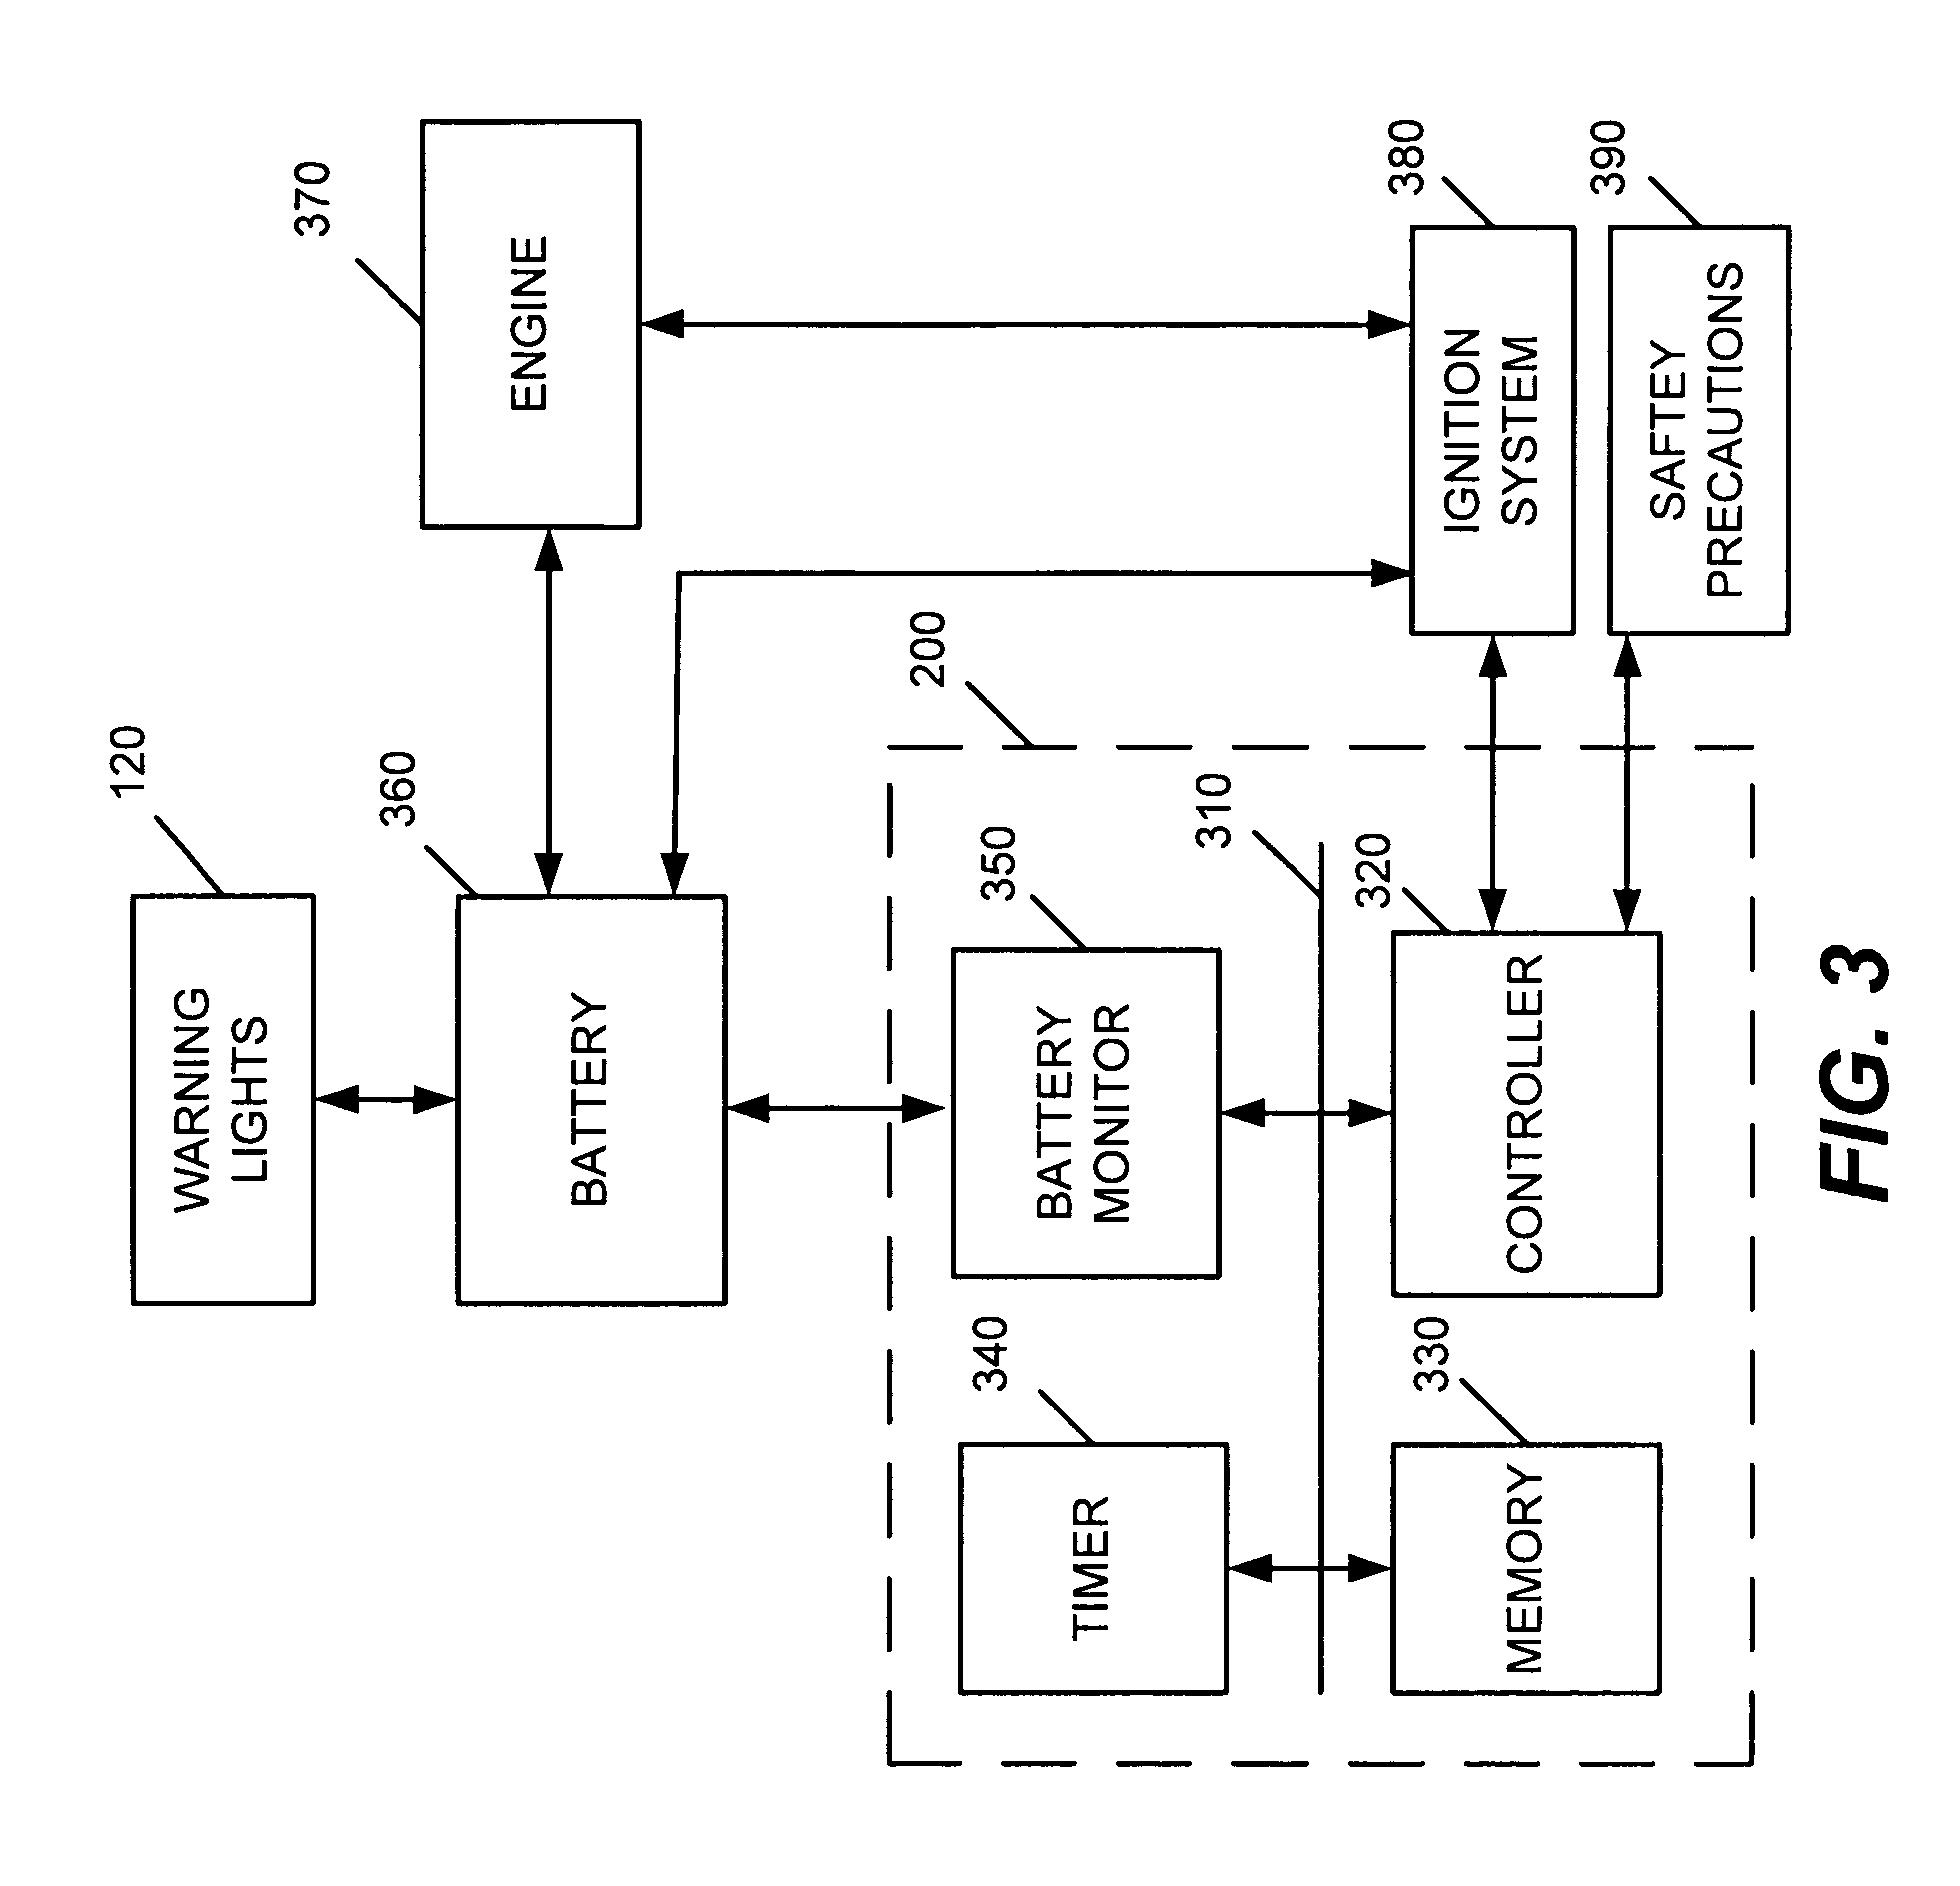 1999 dodge dakota computer wiring diagram